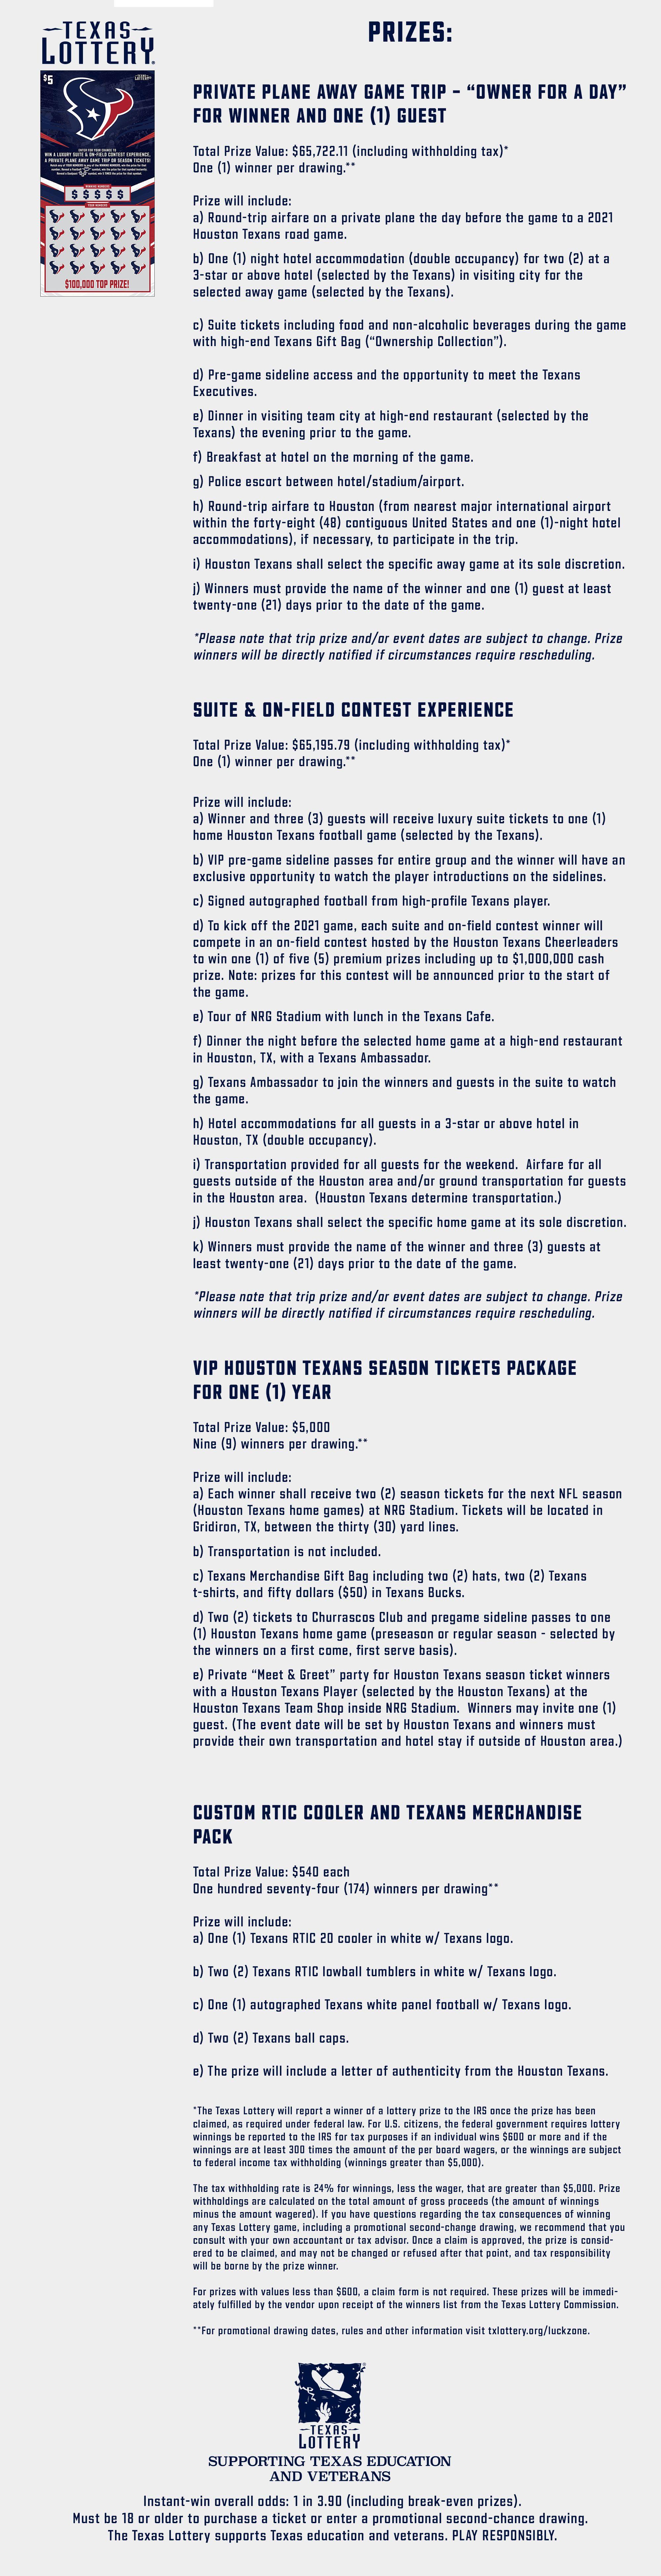 web_TexasLottery2020_Prizes